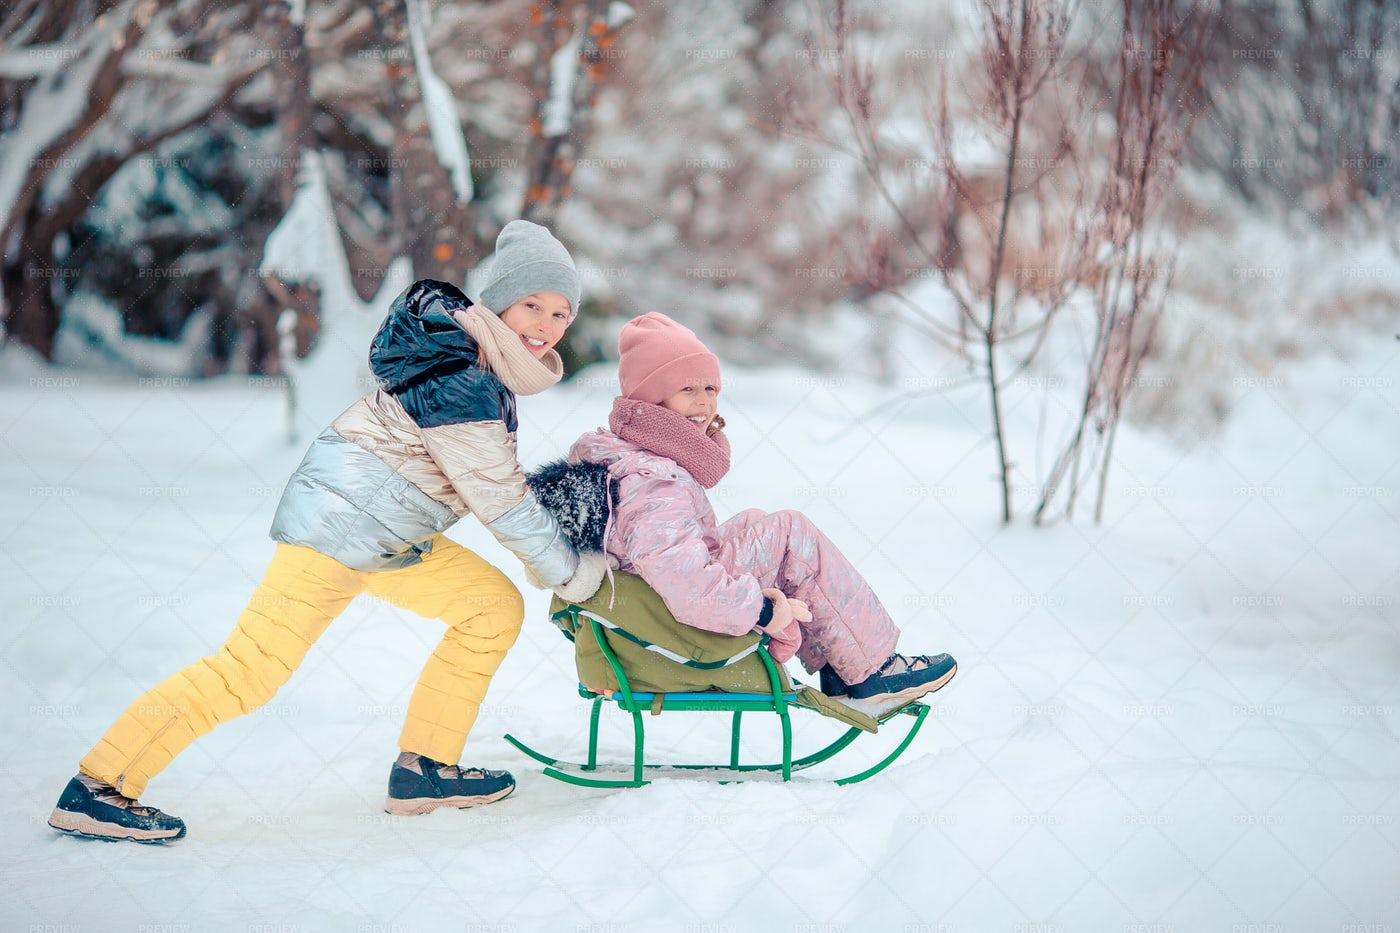 Happy Girls Sledding: Stock Photos